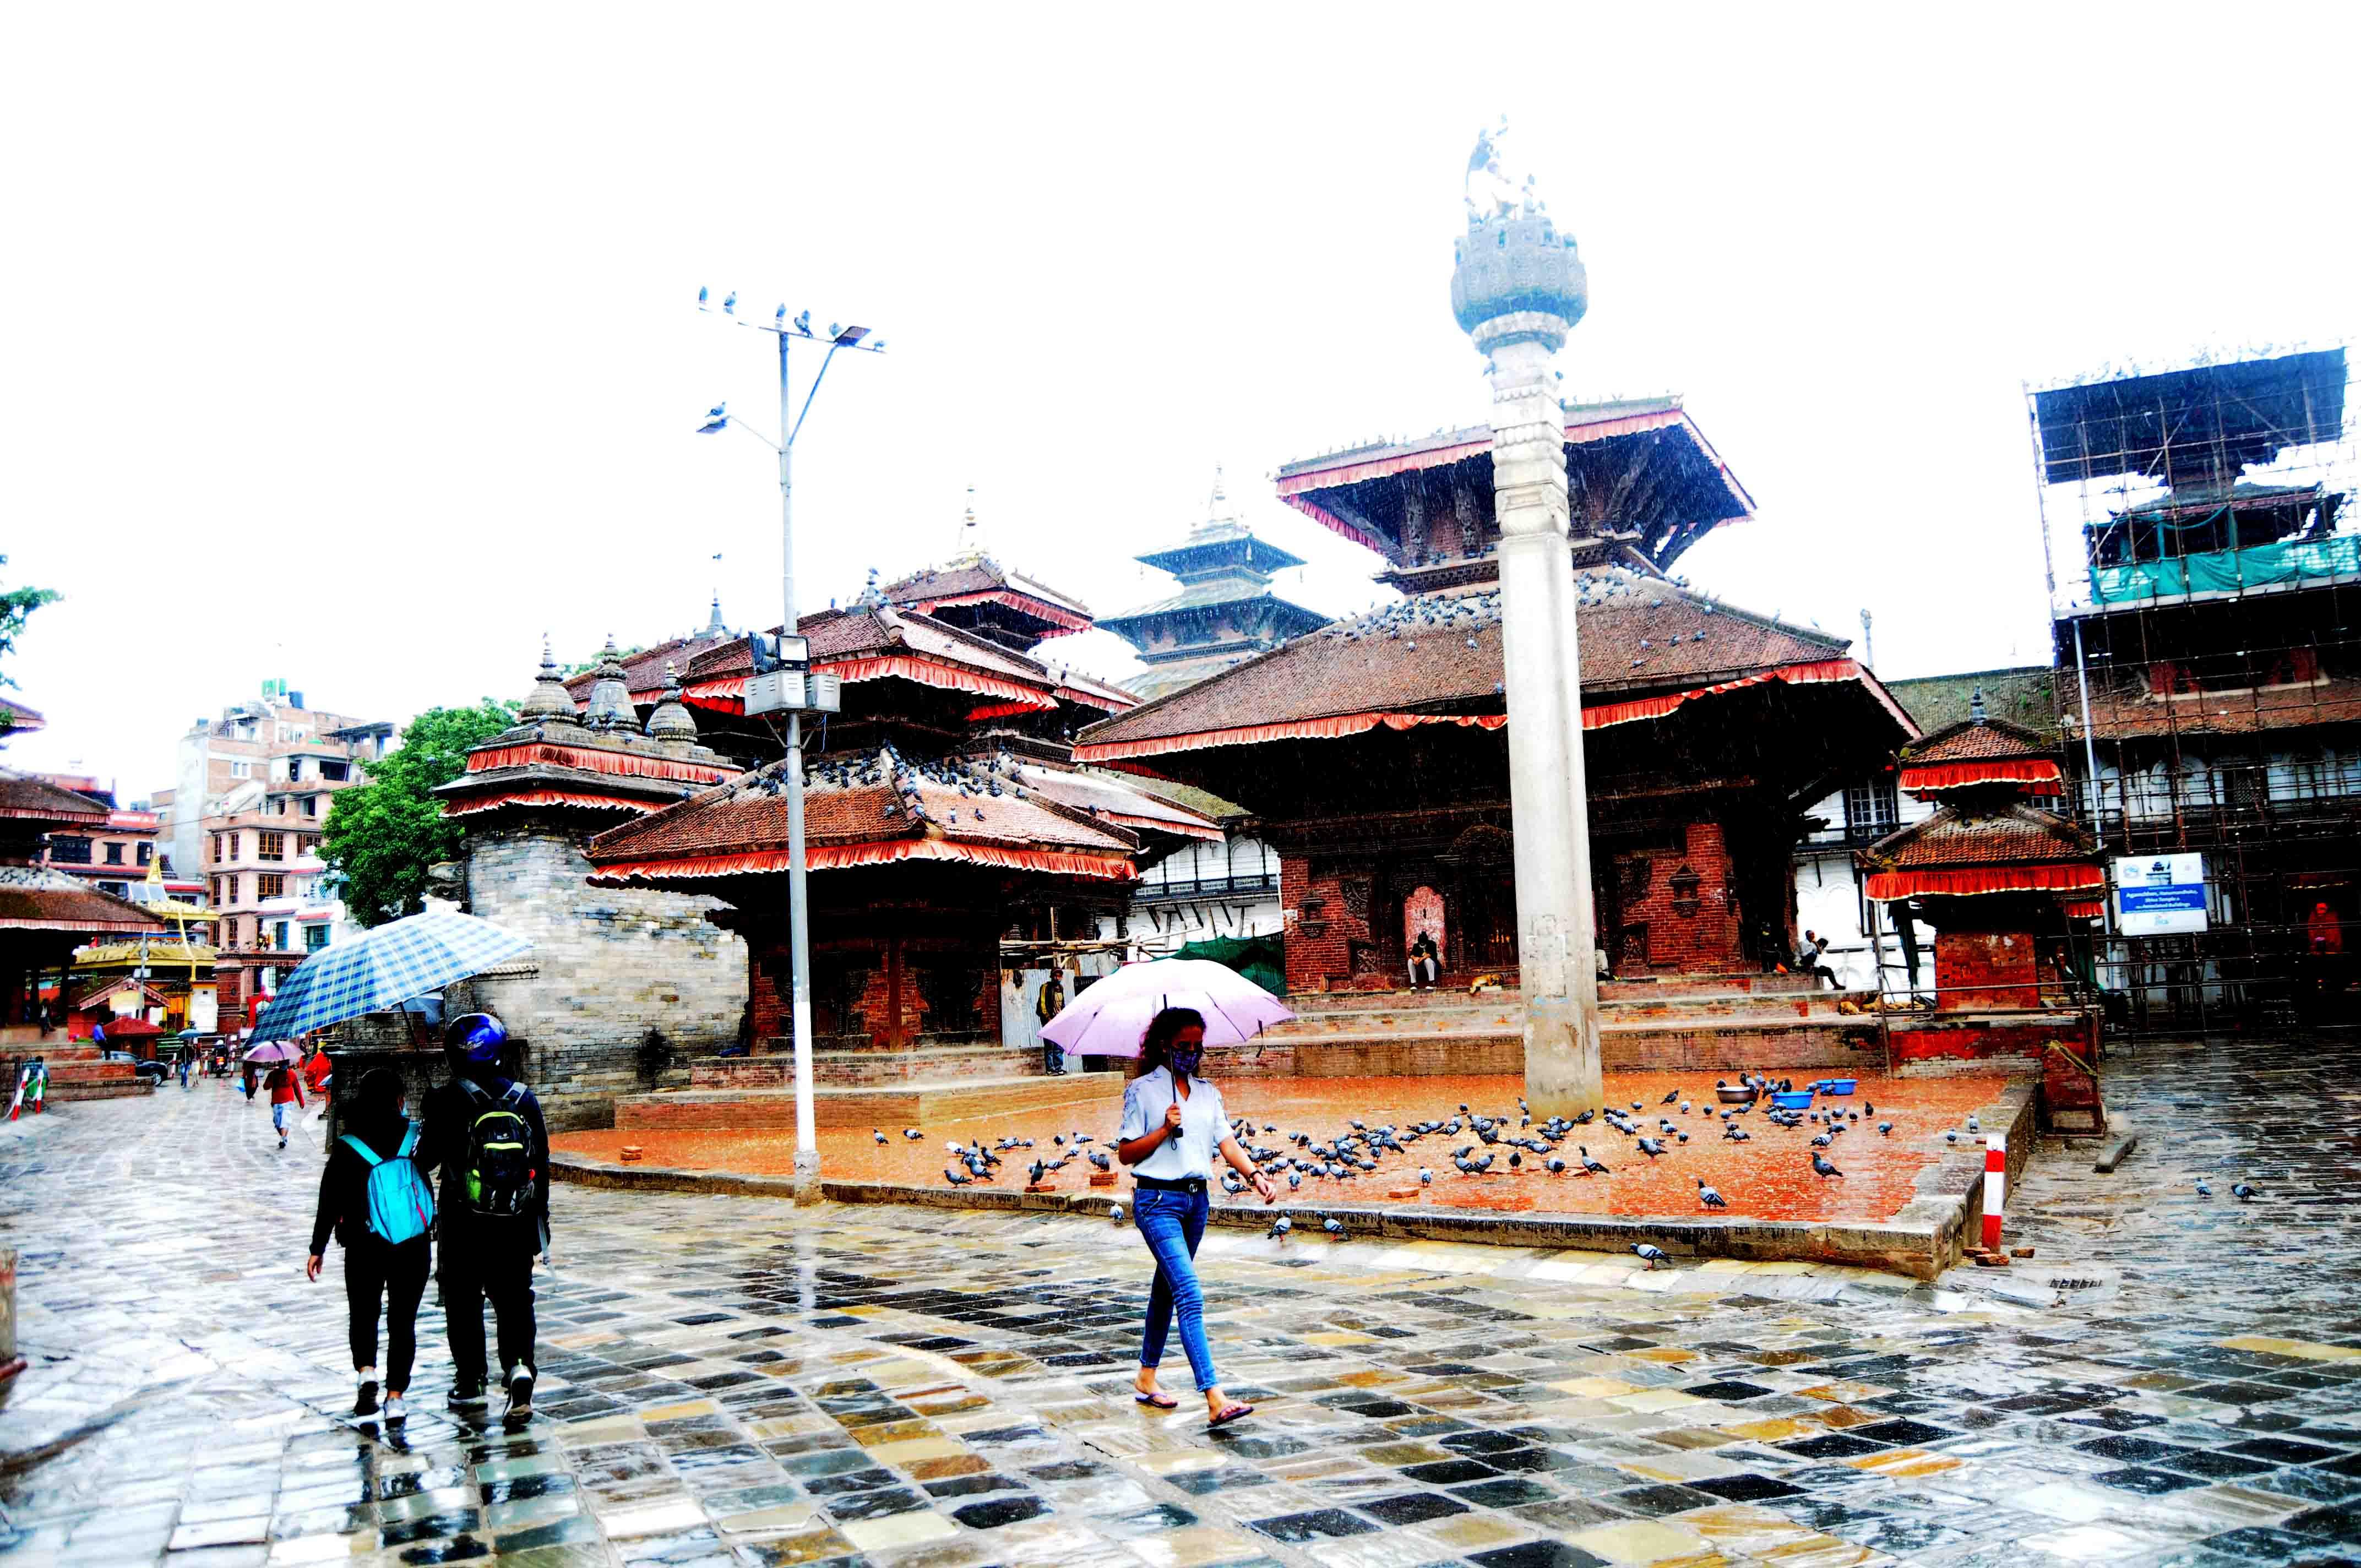 People go out and about on a rainy day, under their umberellas, at Hanumandhoka in kathmandu on Sunday. Photo: Balkrishna Thapa Chhetri/THT